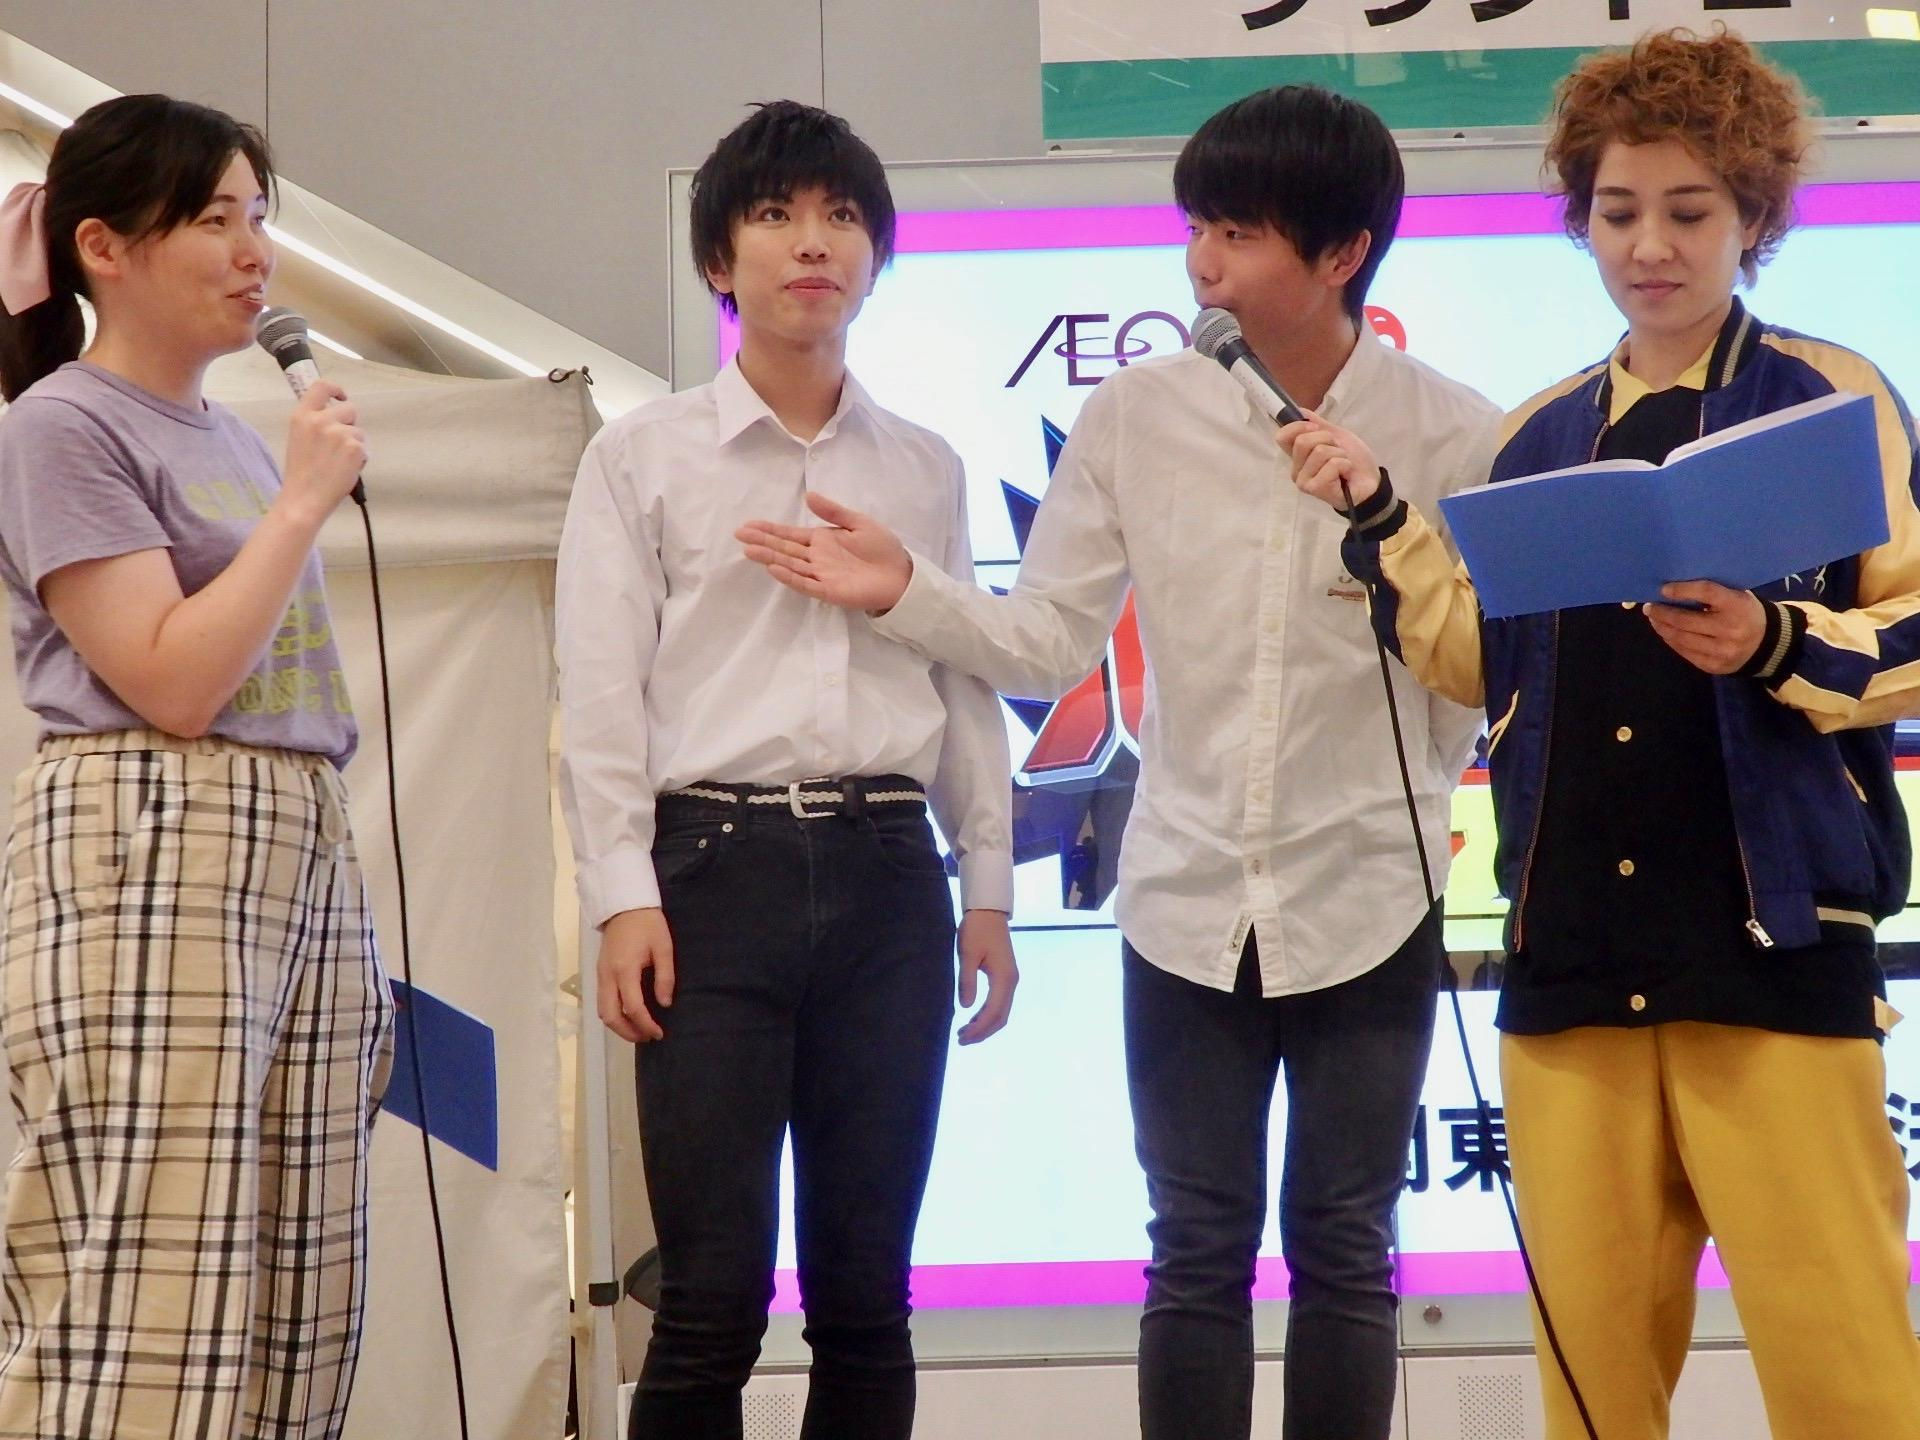 http://news.yoshimoto.co.jp/20180901155102-f23a5b797735668f96bdf9339ce3d03e69130d38.jpg